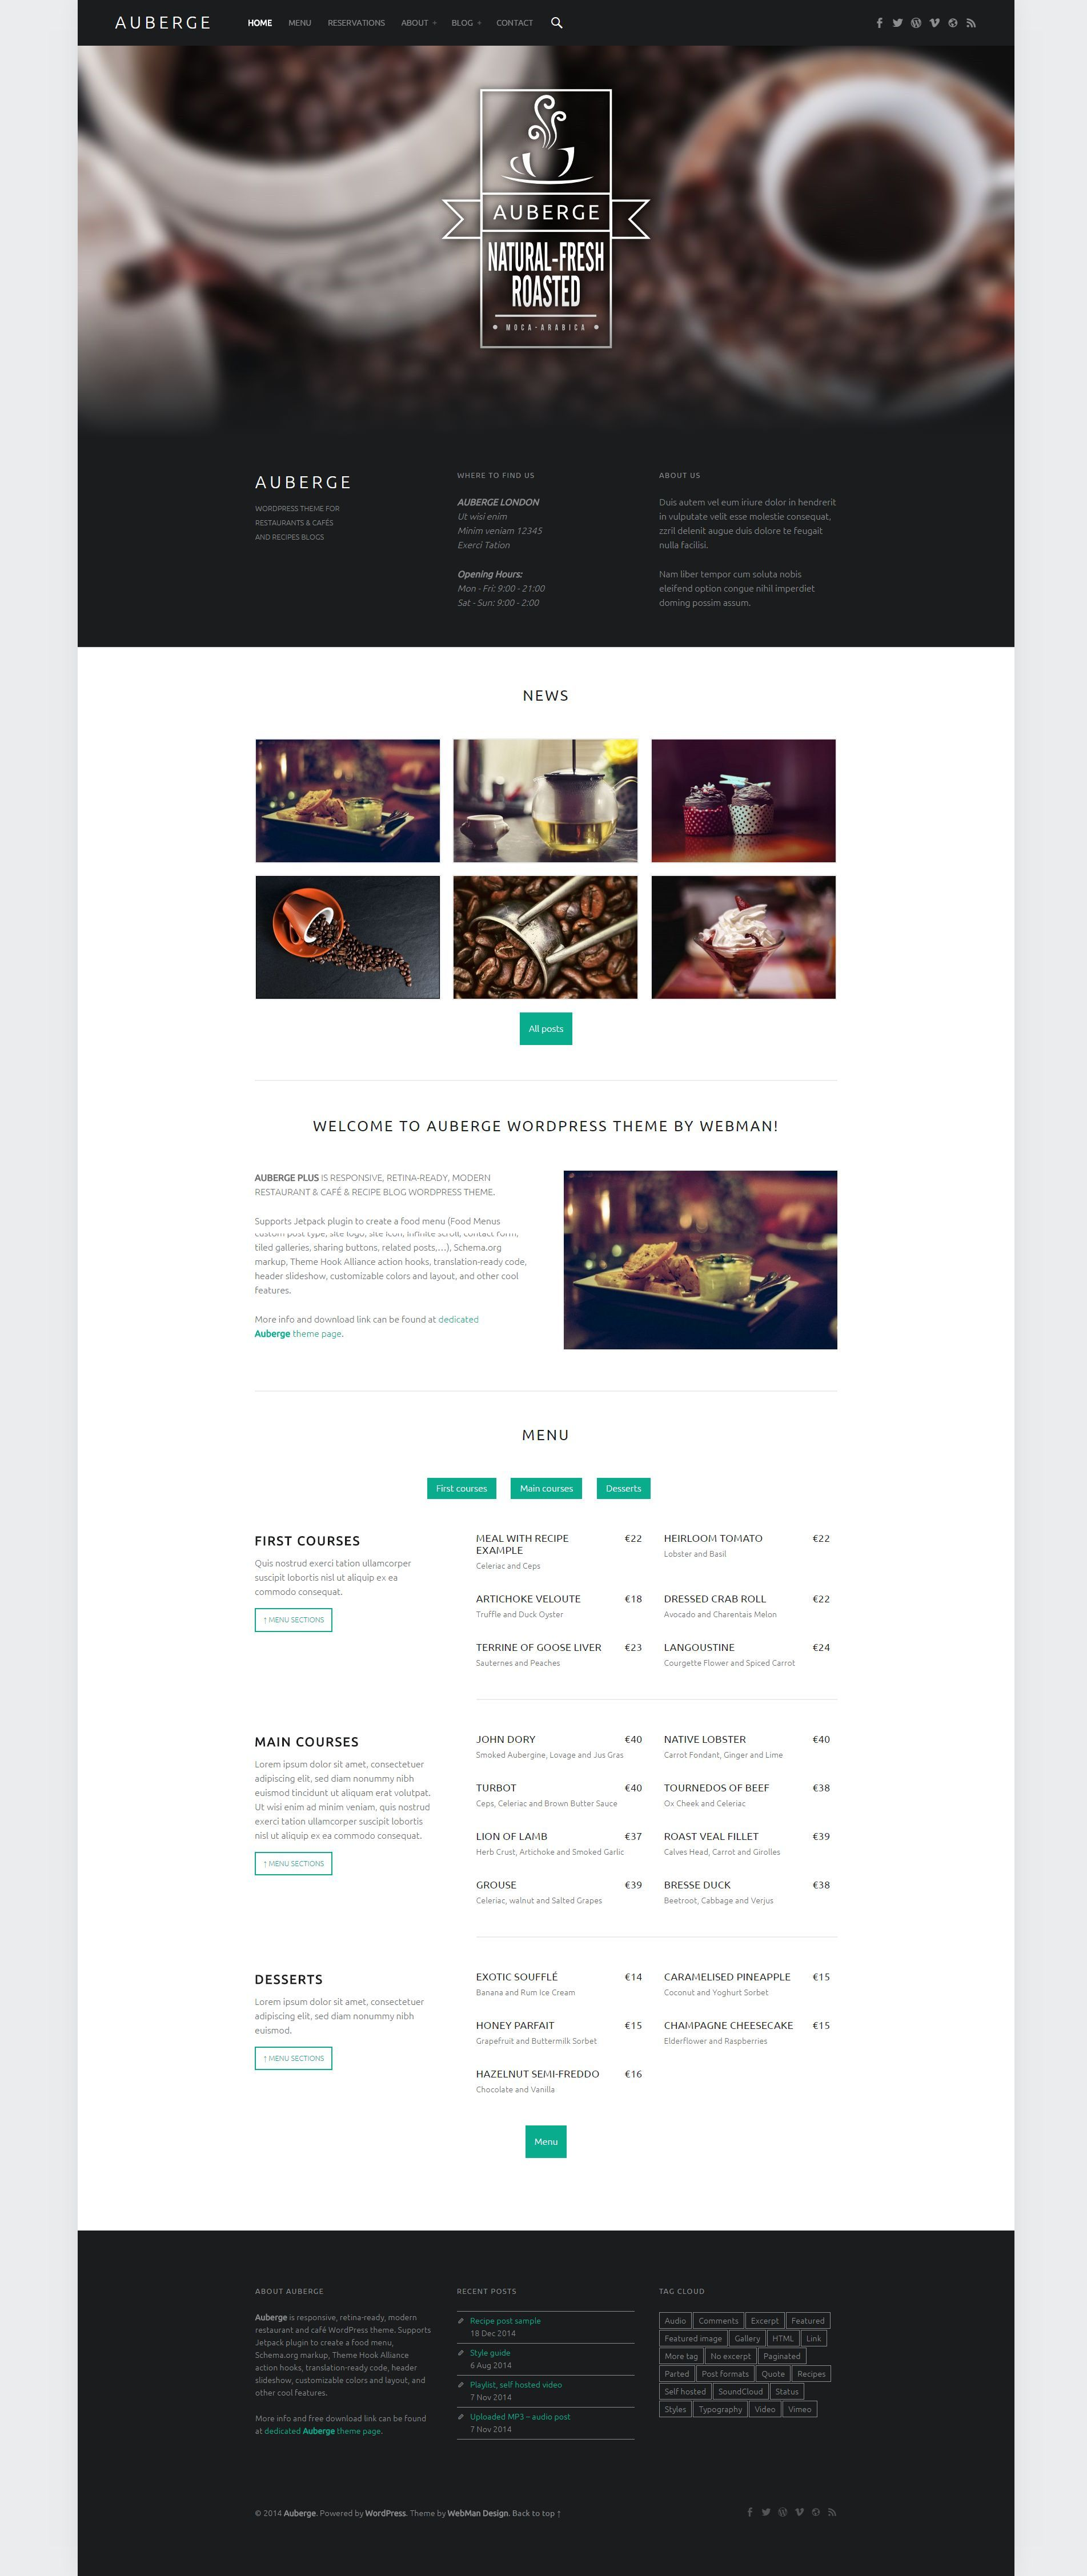 Auberge Plus | WordPress Theme by WebMan Design on Creative Market